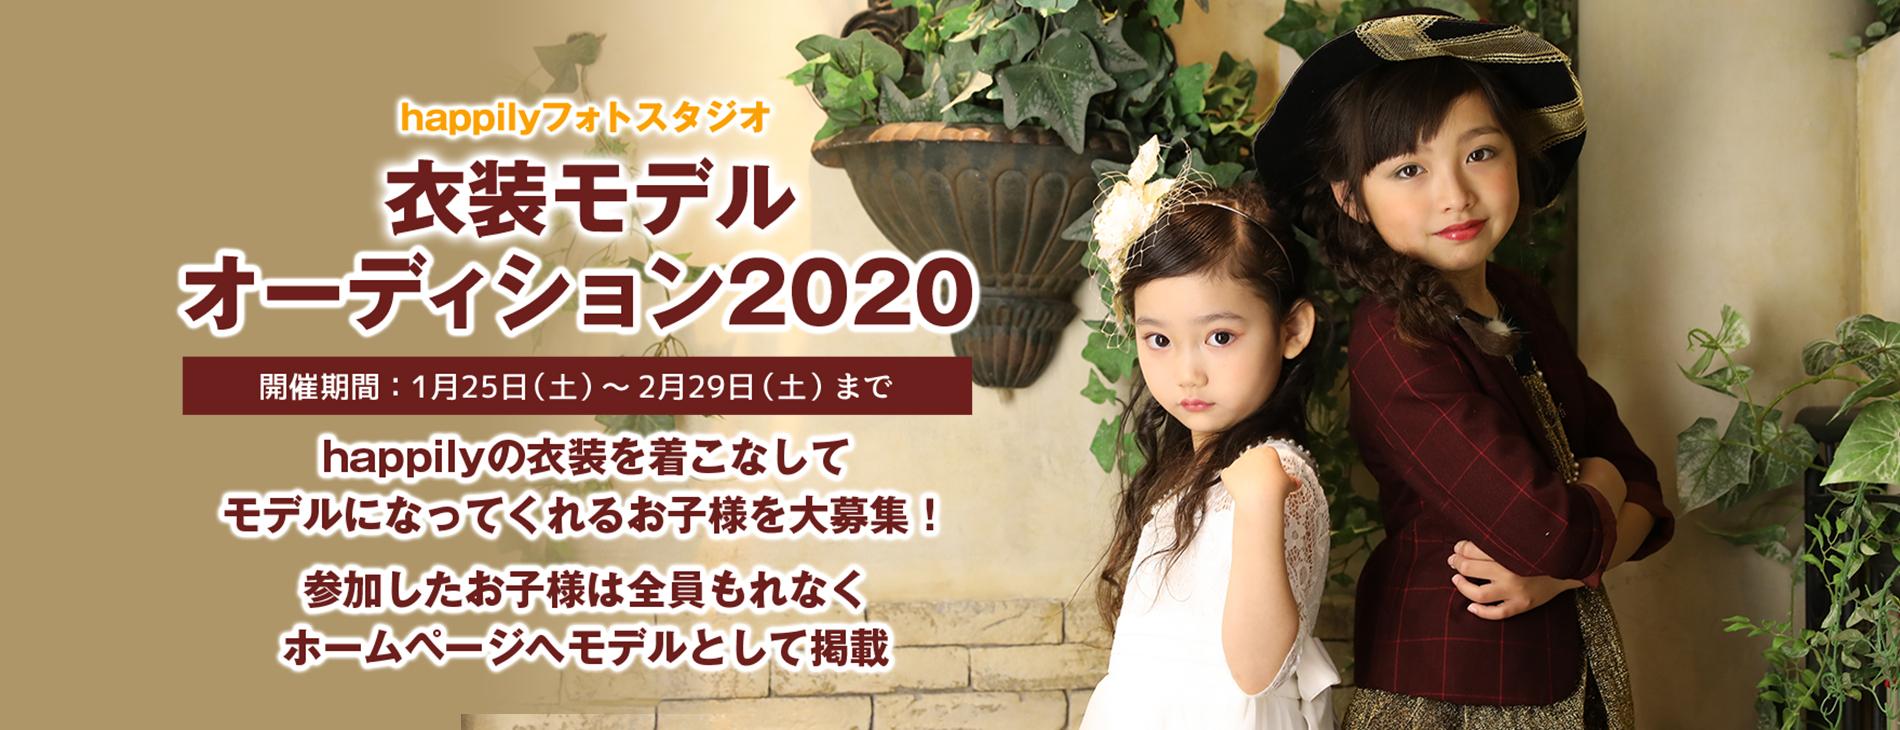 happily衣装モデルオーディション 2020